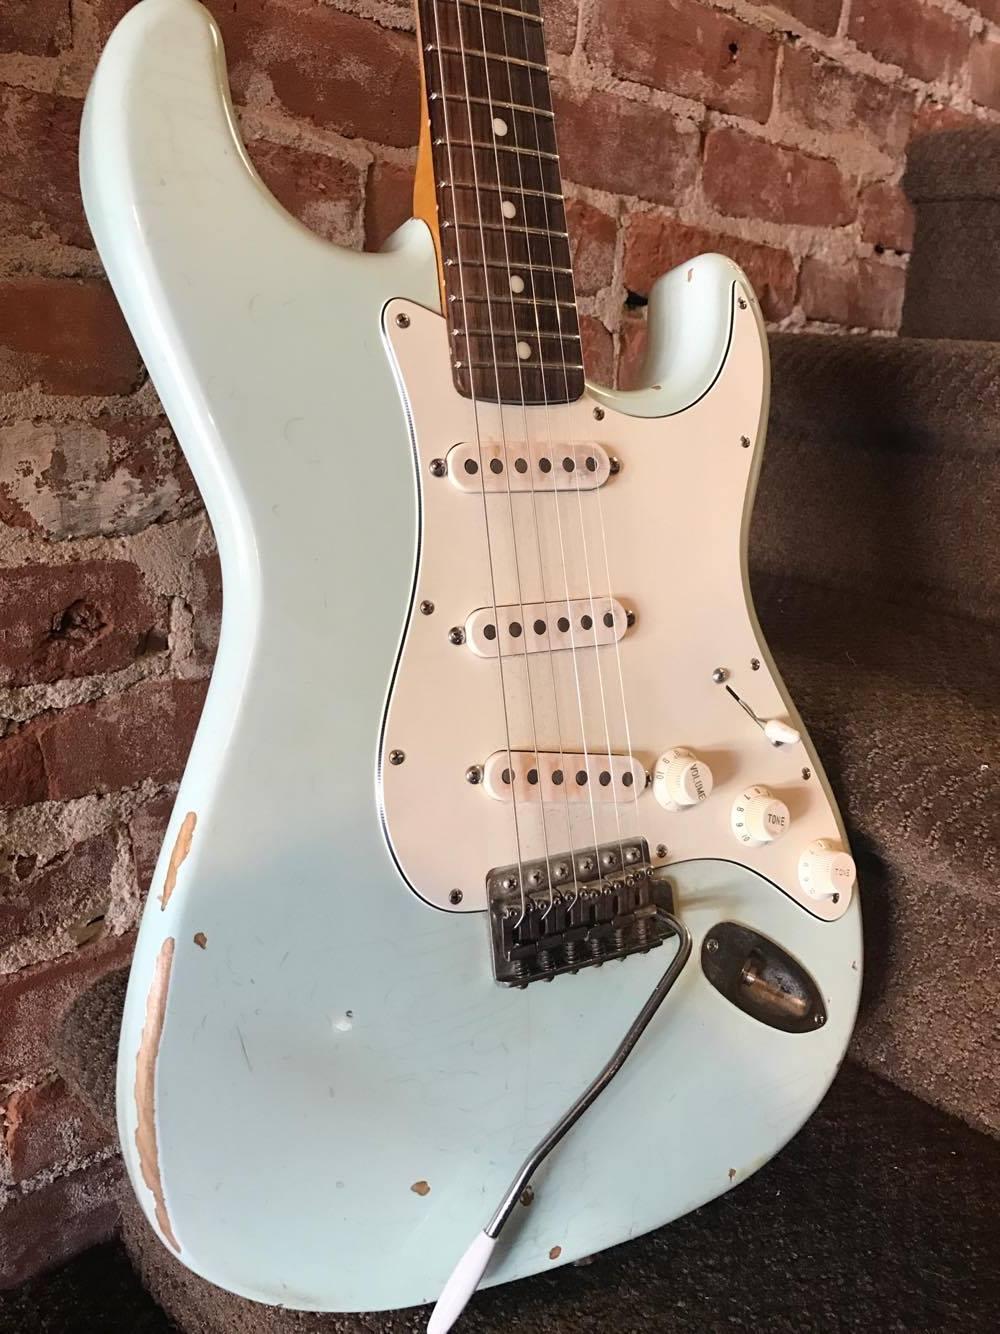 Seuf Stratocaster Relic